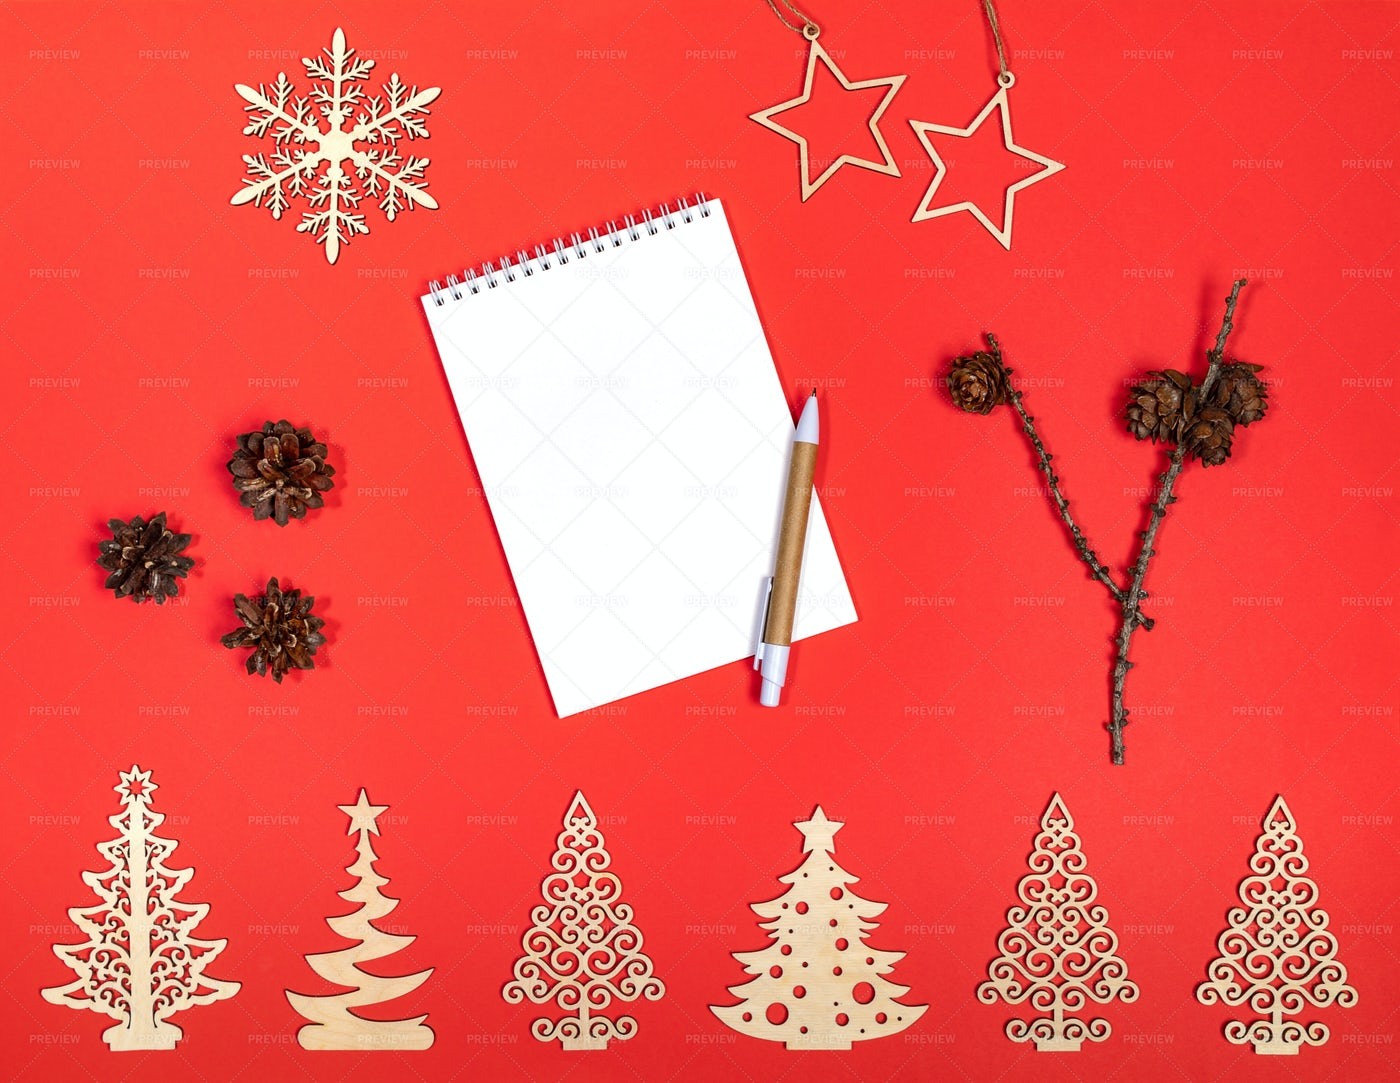 Festive Xmas Red Background.: Stock Photos